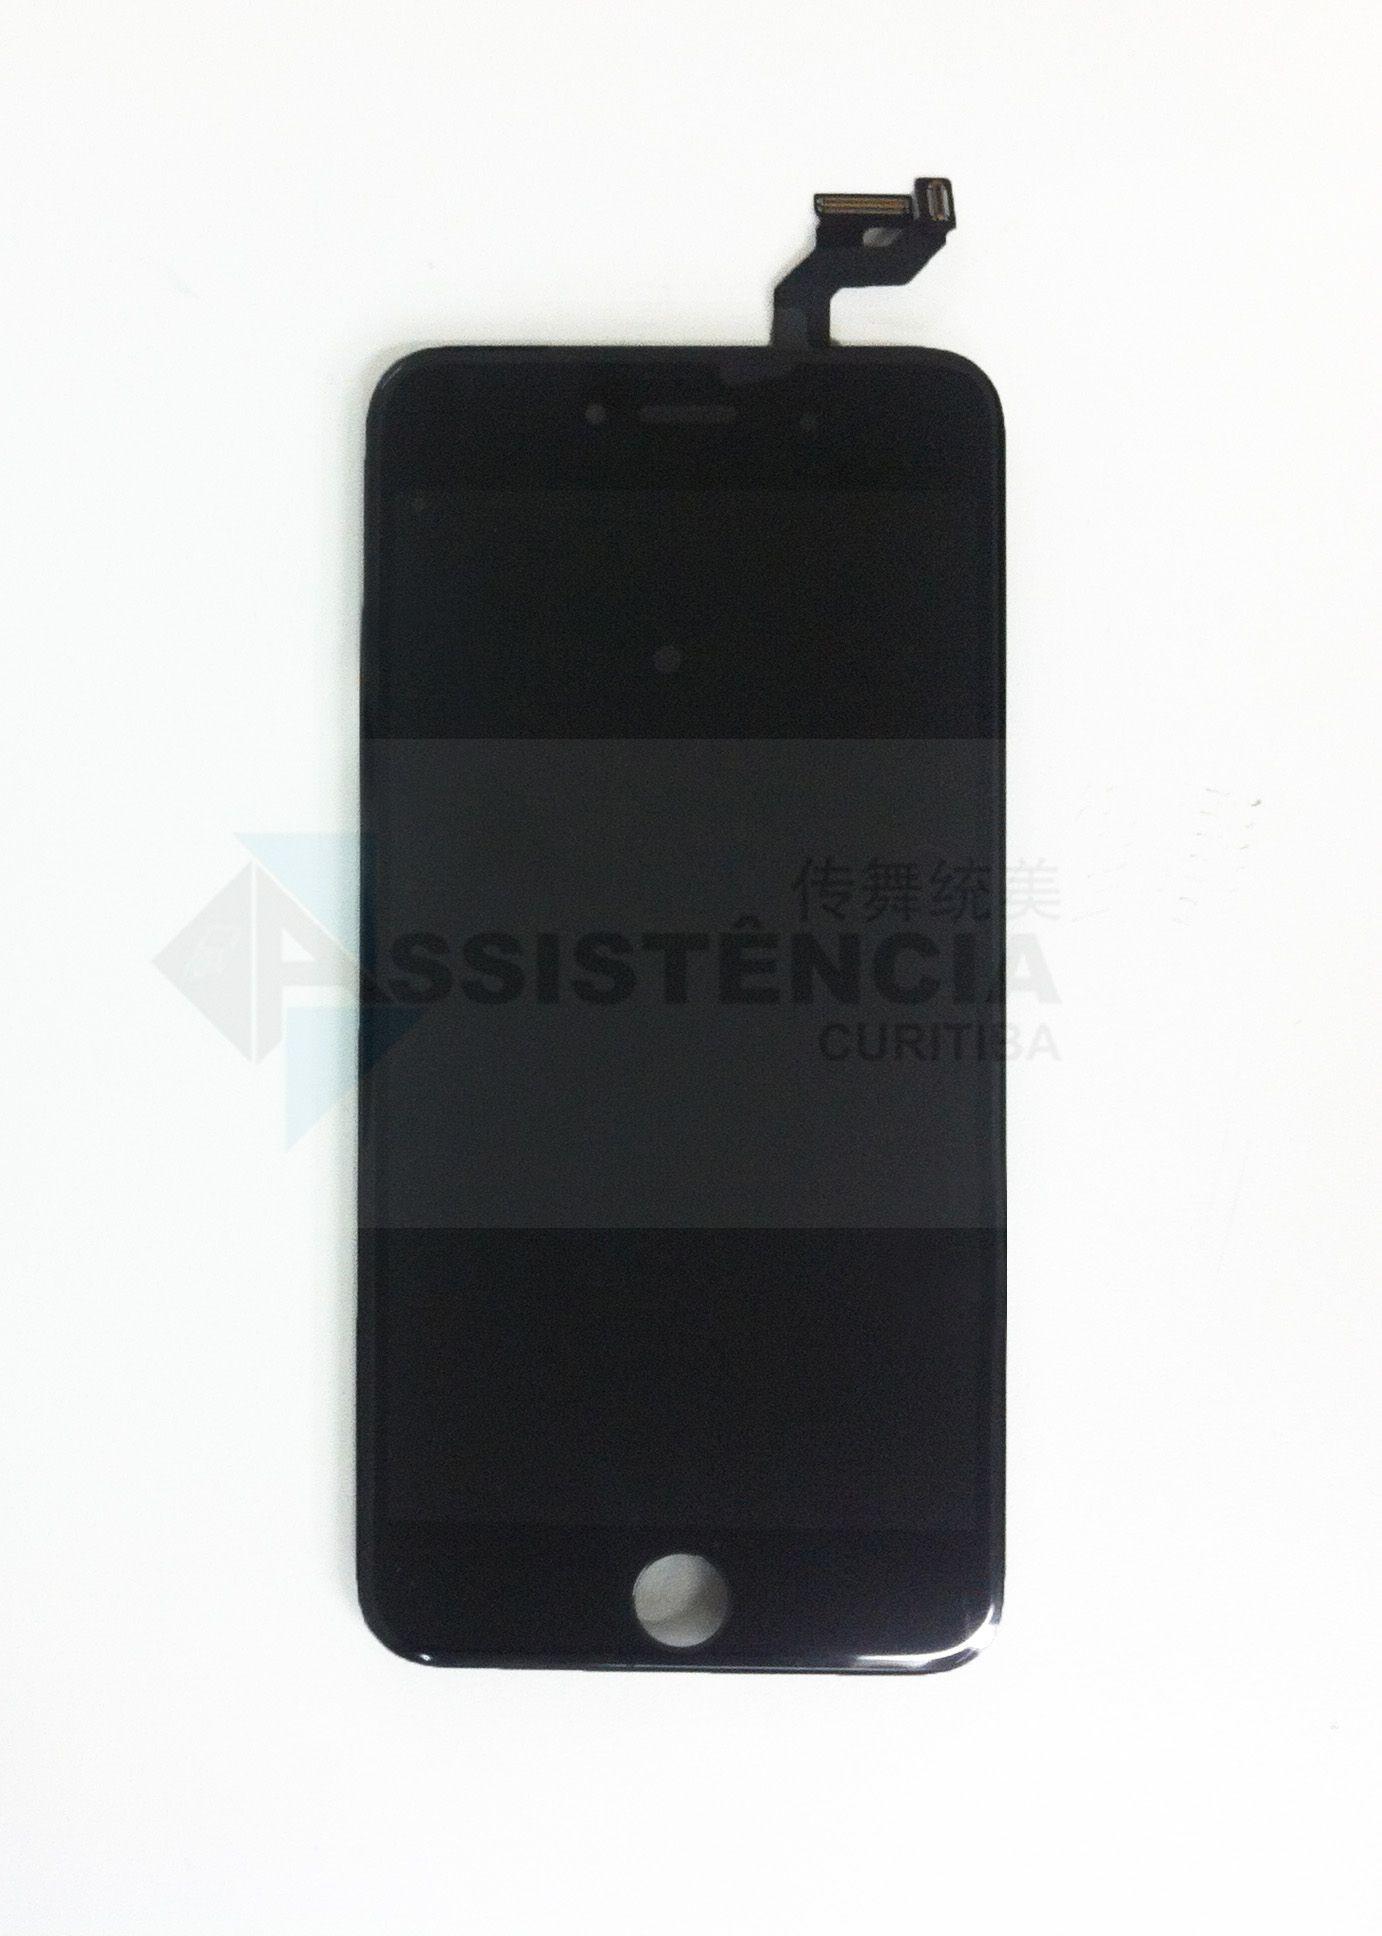 Tela Display Apple Iphone 6S A1633 A1688 A1691 A1700 4.7 Preto